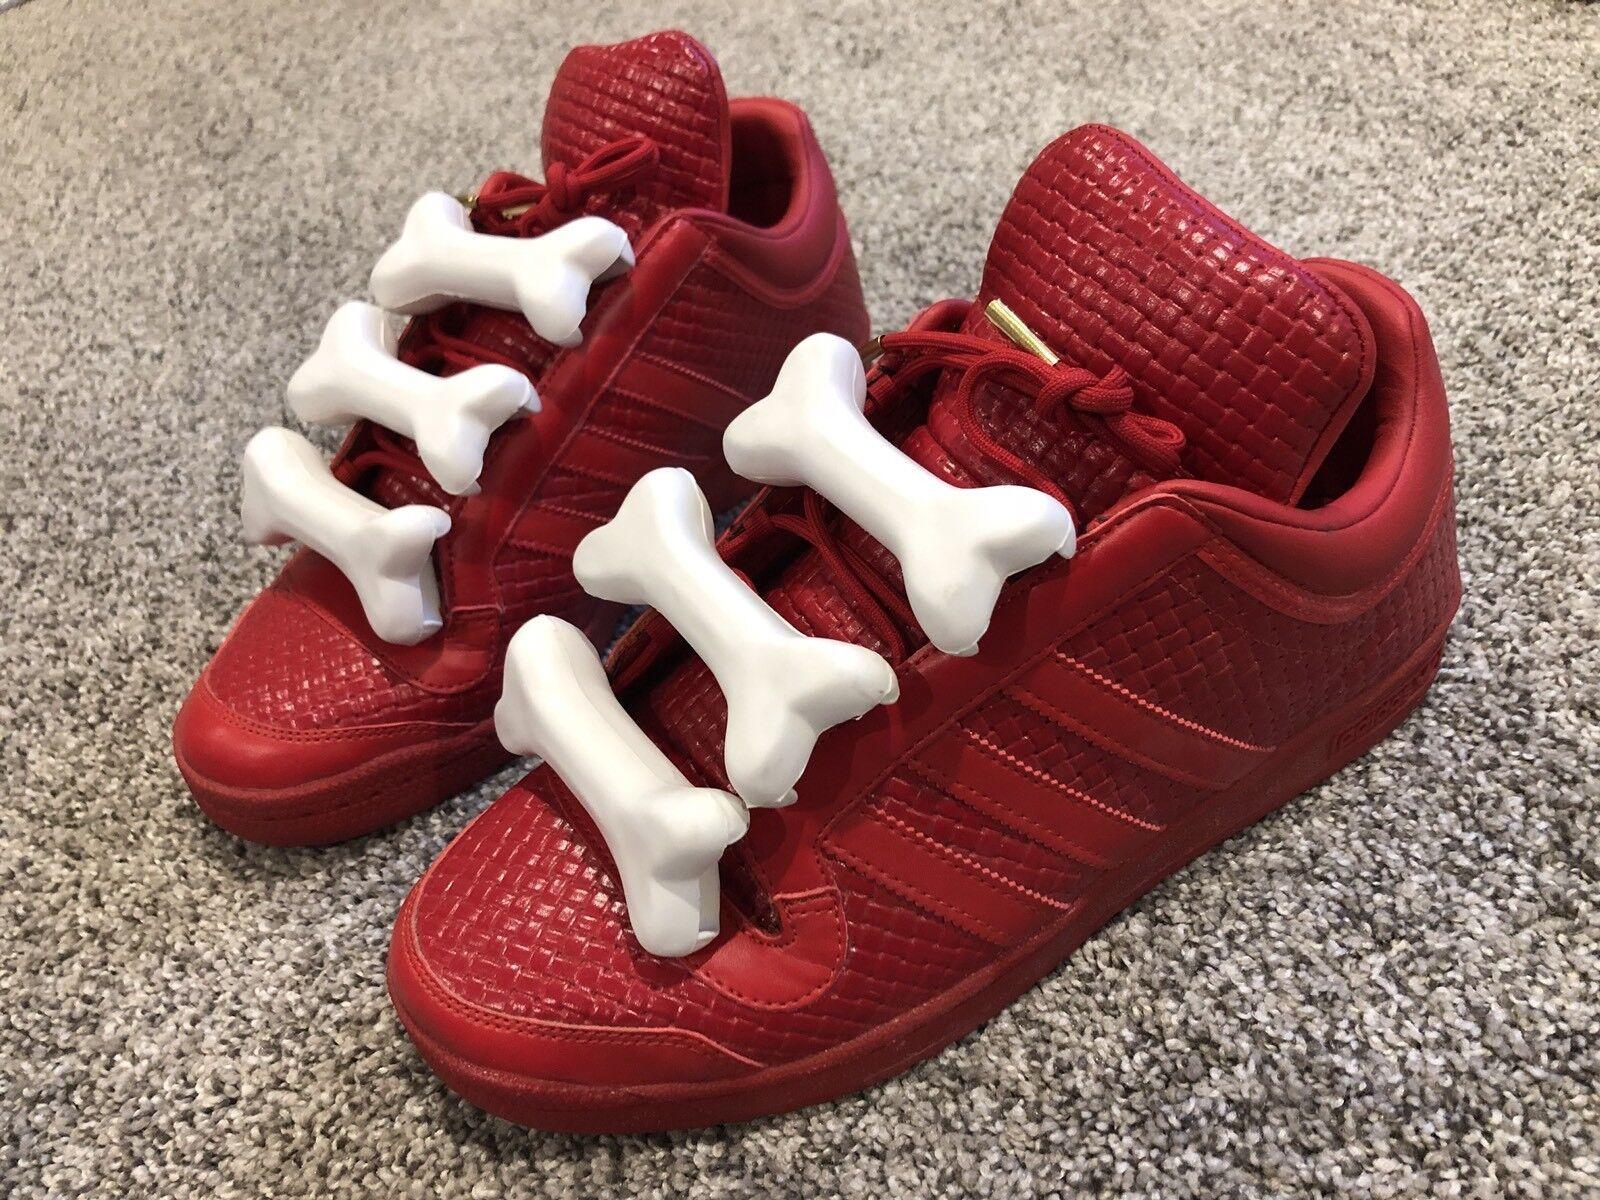 Adidas jeremy scott misura ossa omaggio, misura scott 10,5, raro!!!! 3c9d96